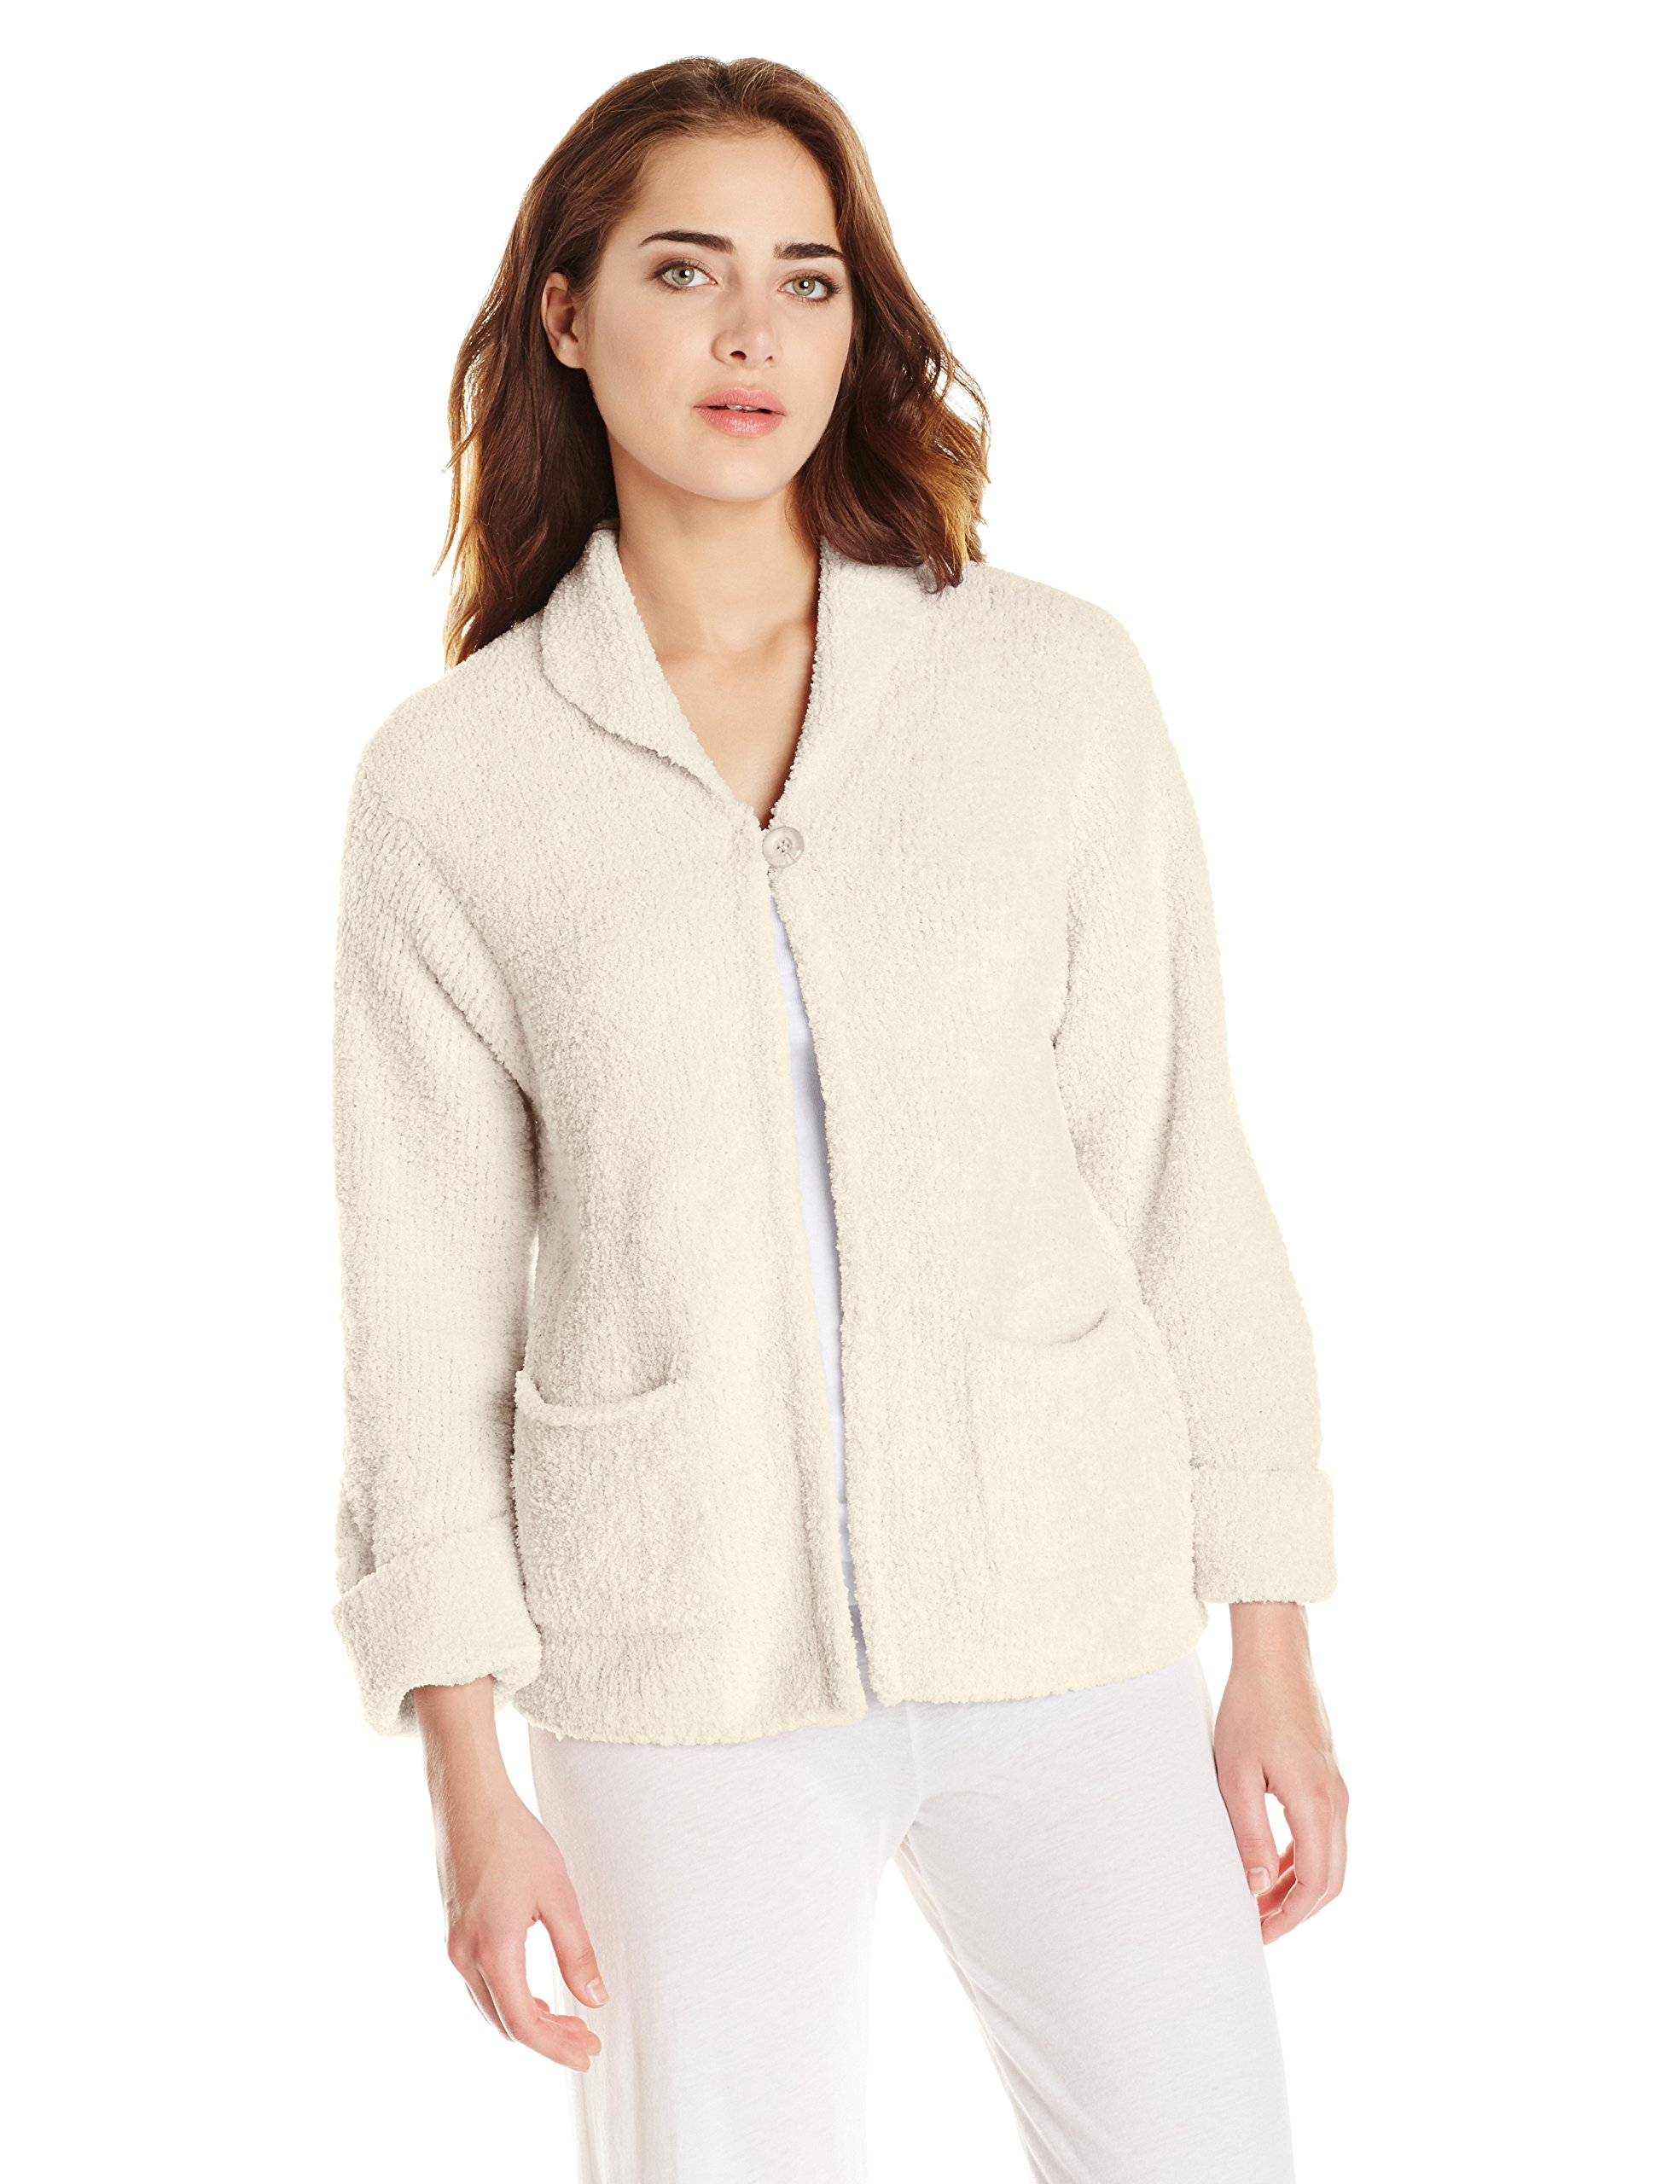 Casual Moments Women's Bed Jacket, Cream, Medium